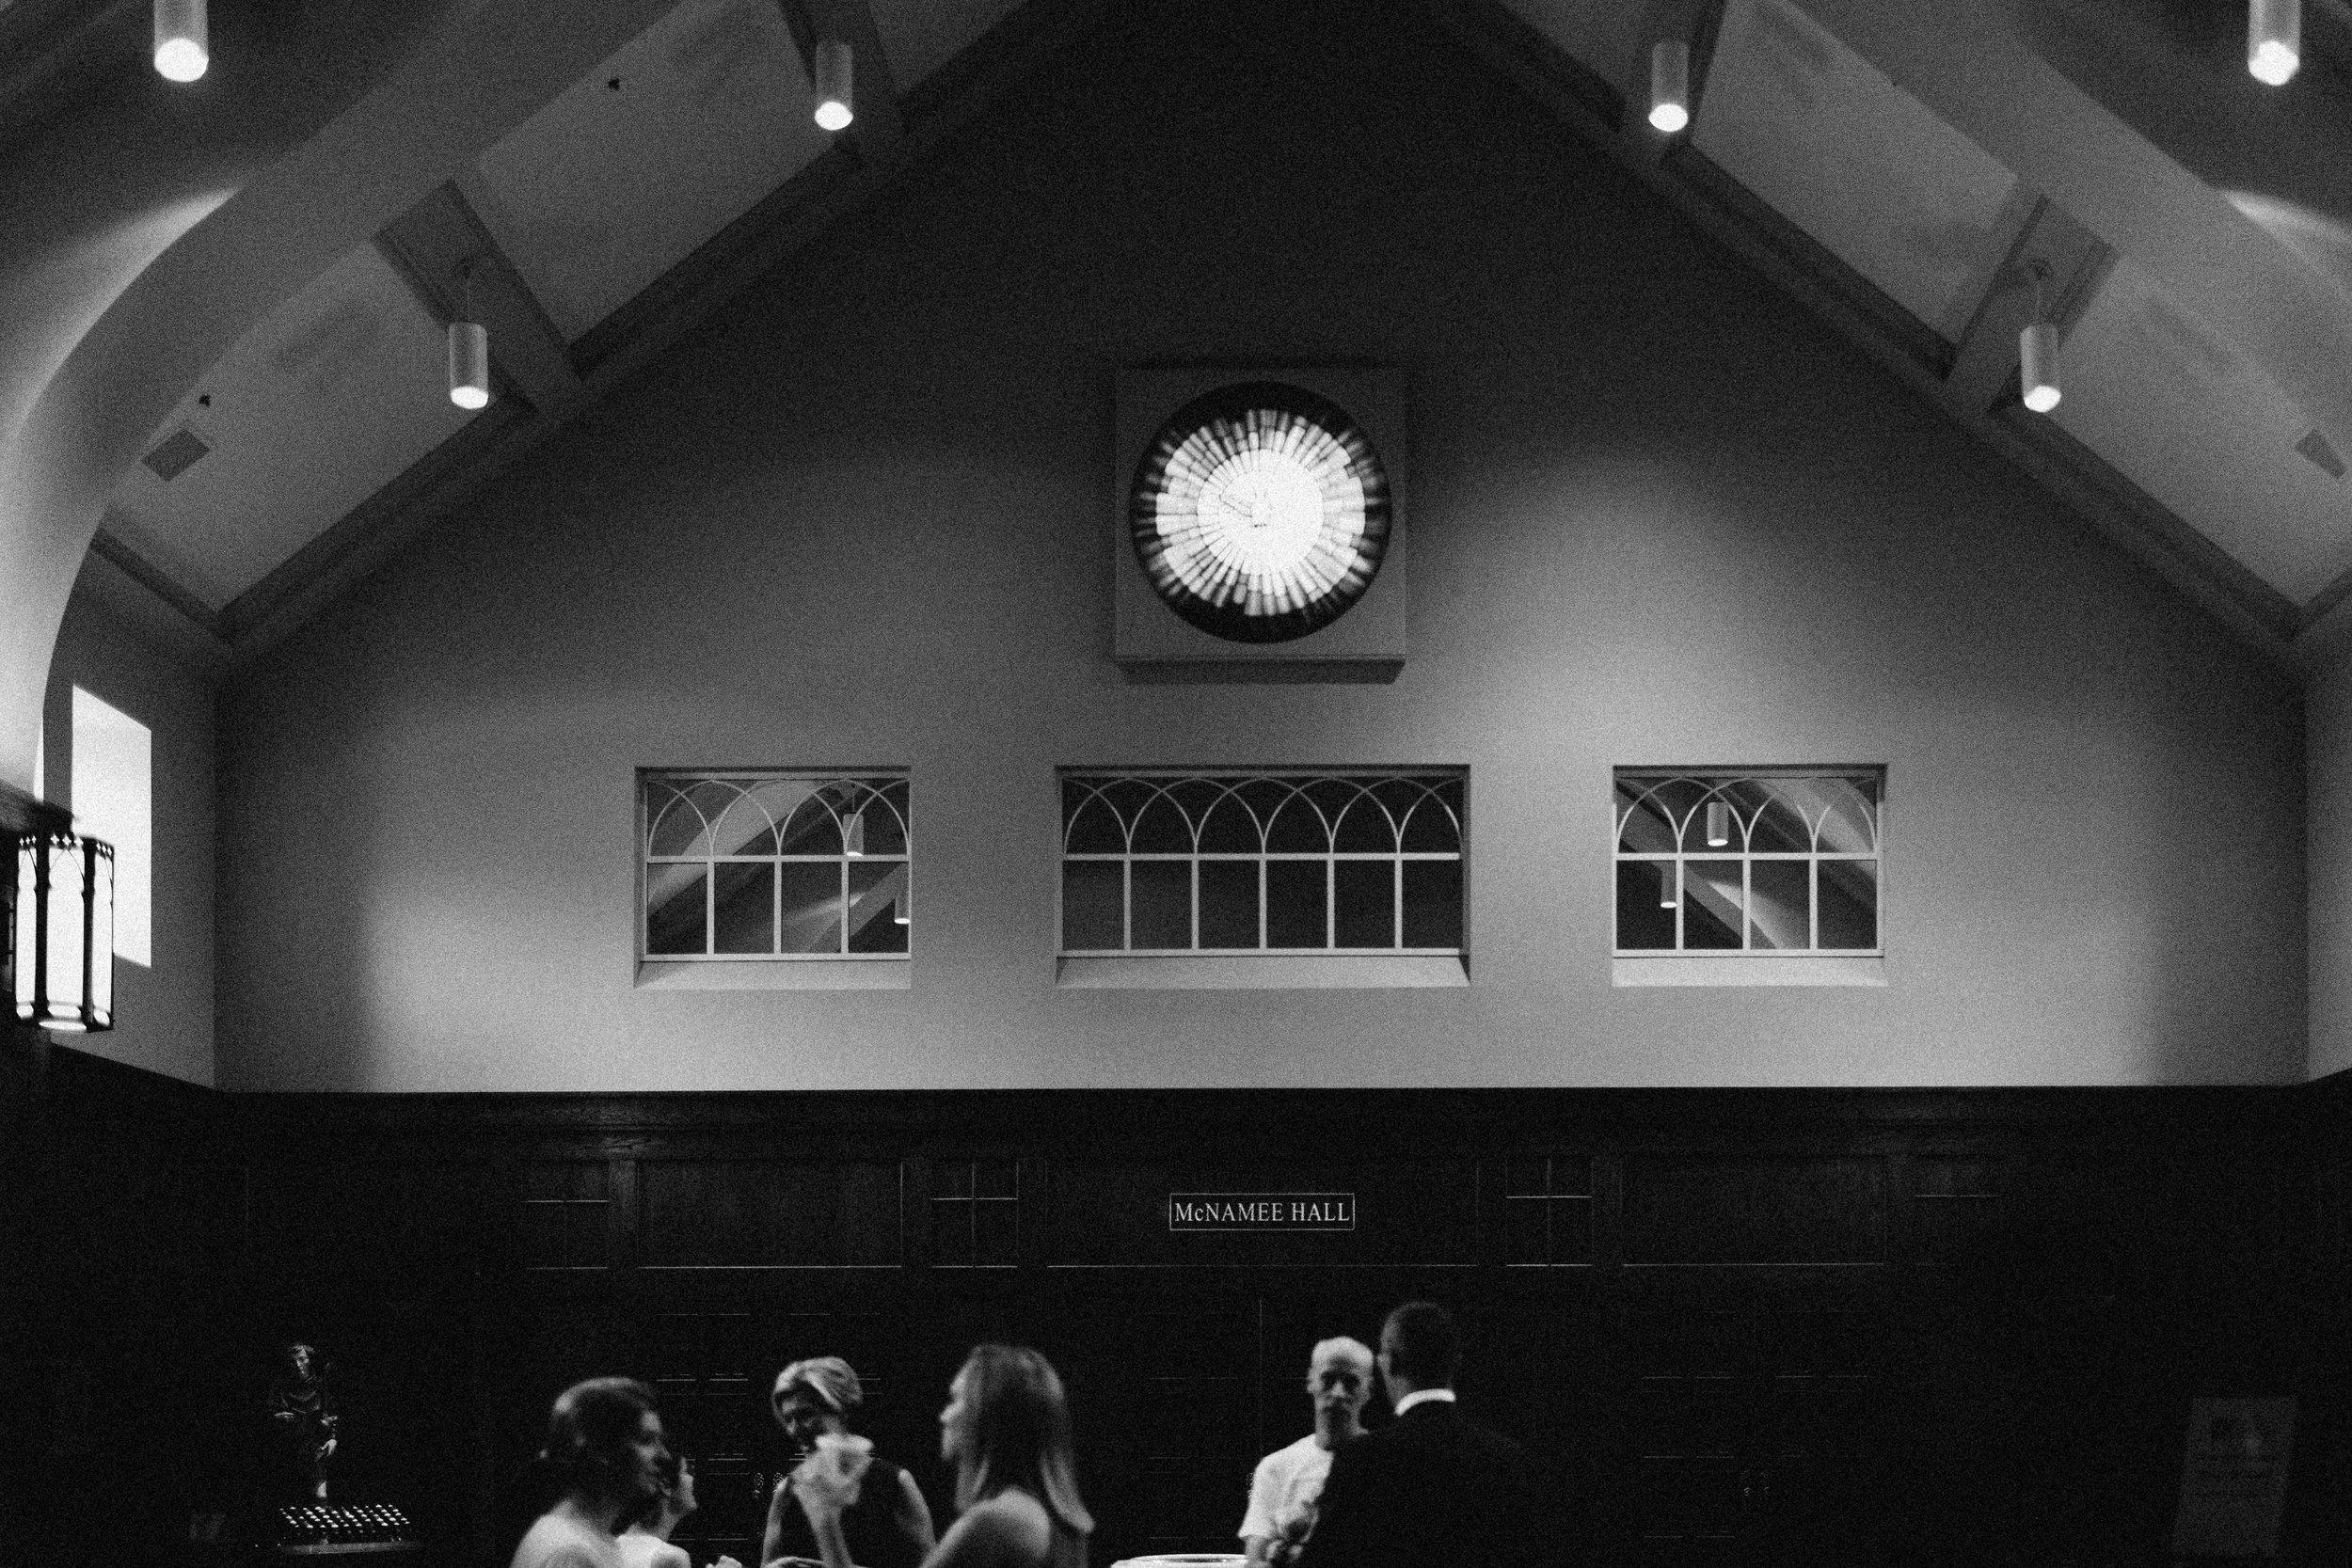 roswell_st_peter_chanel_catholic_avalon_hotel_alpharetta_wedding-1345.jpg